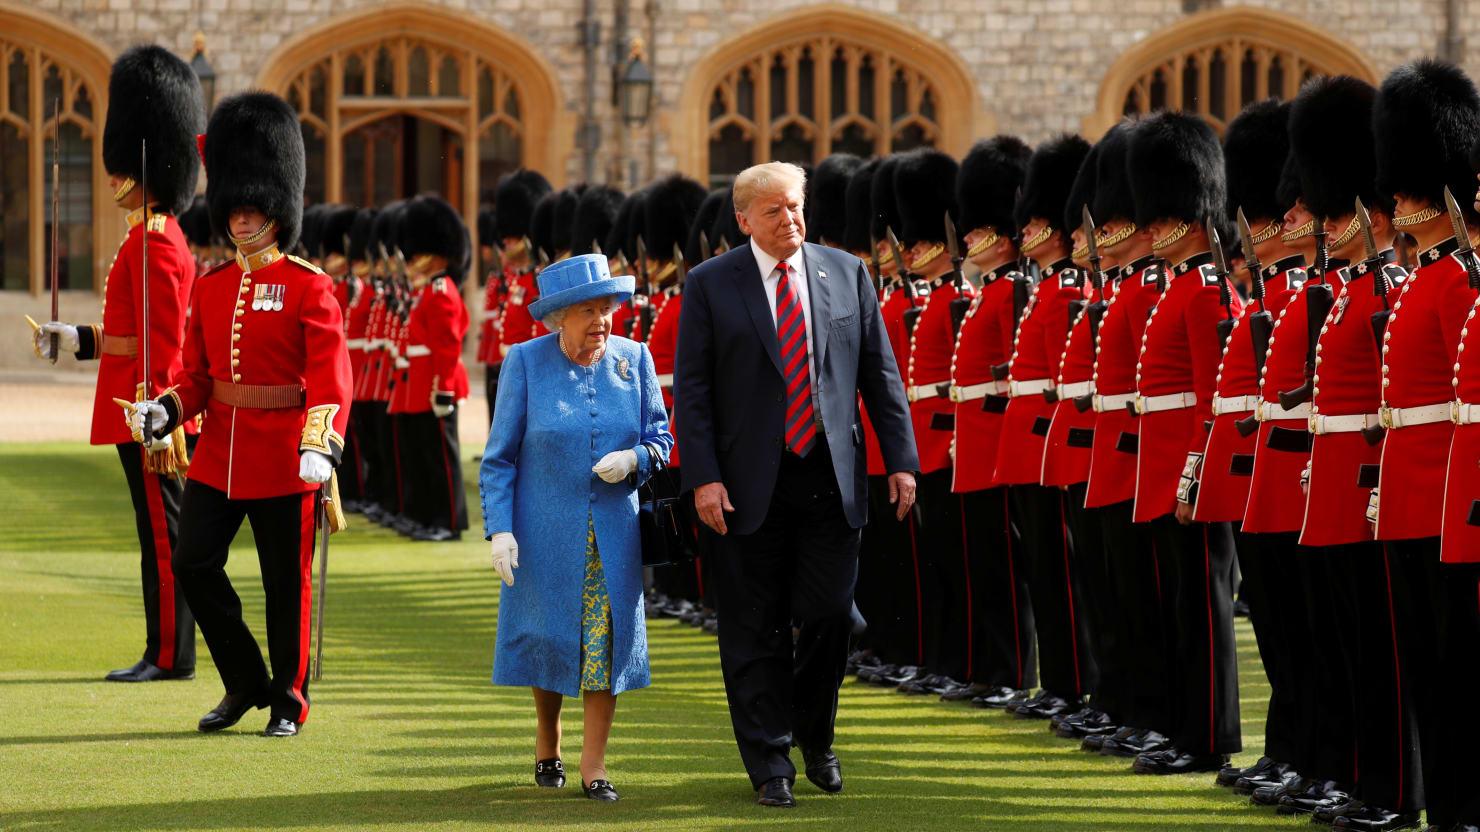 Trump Will Visit Queen Elizabeth in June, Buckingham Palace Announces